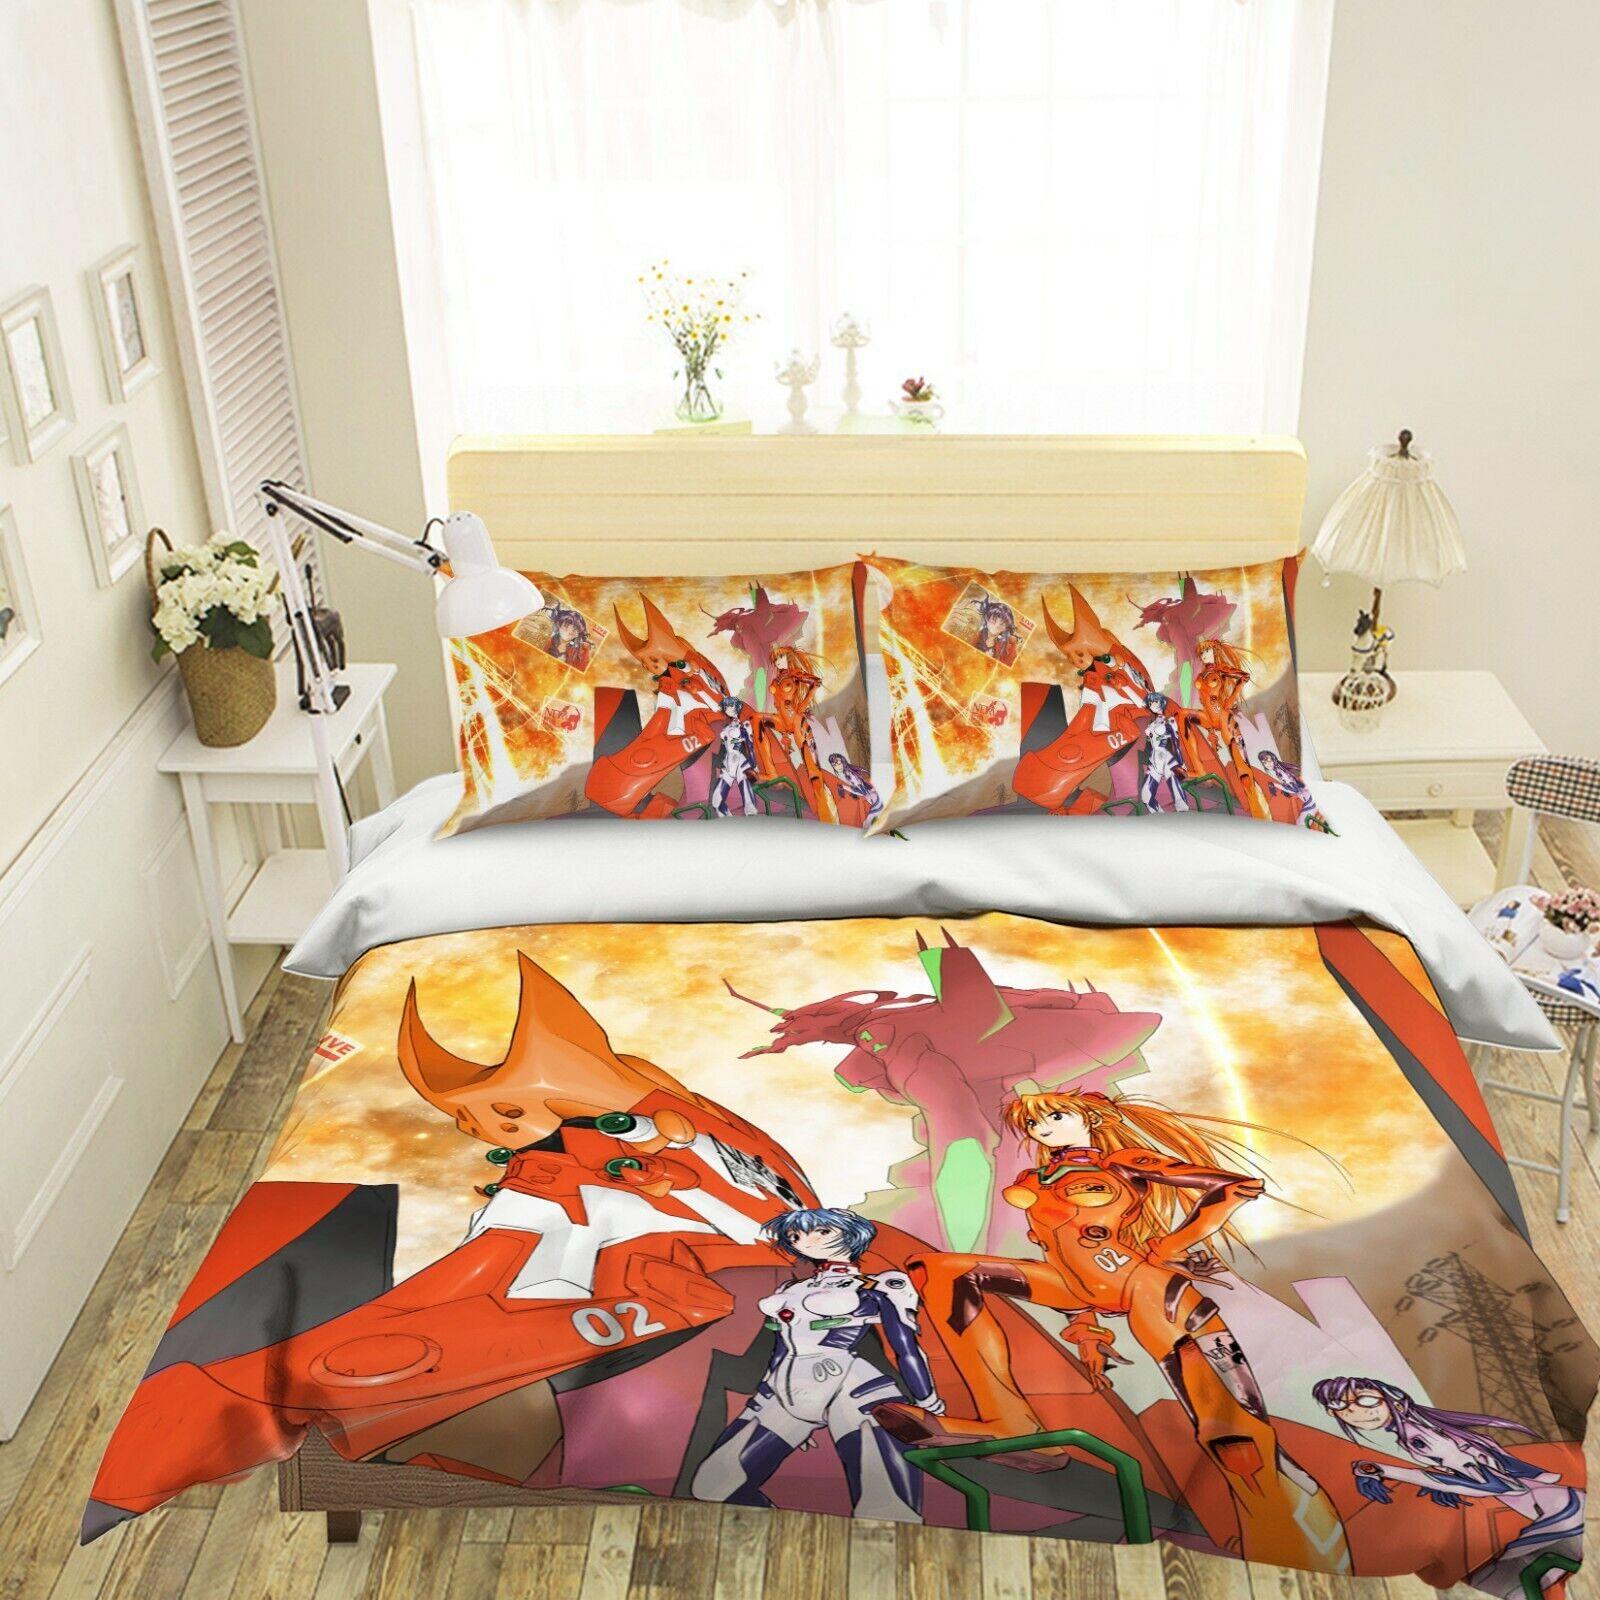 3D Neon Genesis Evangelion C02 Japan Anime Bett Kissenbezüge Quilt Bettdecke Wen